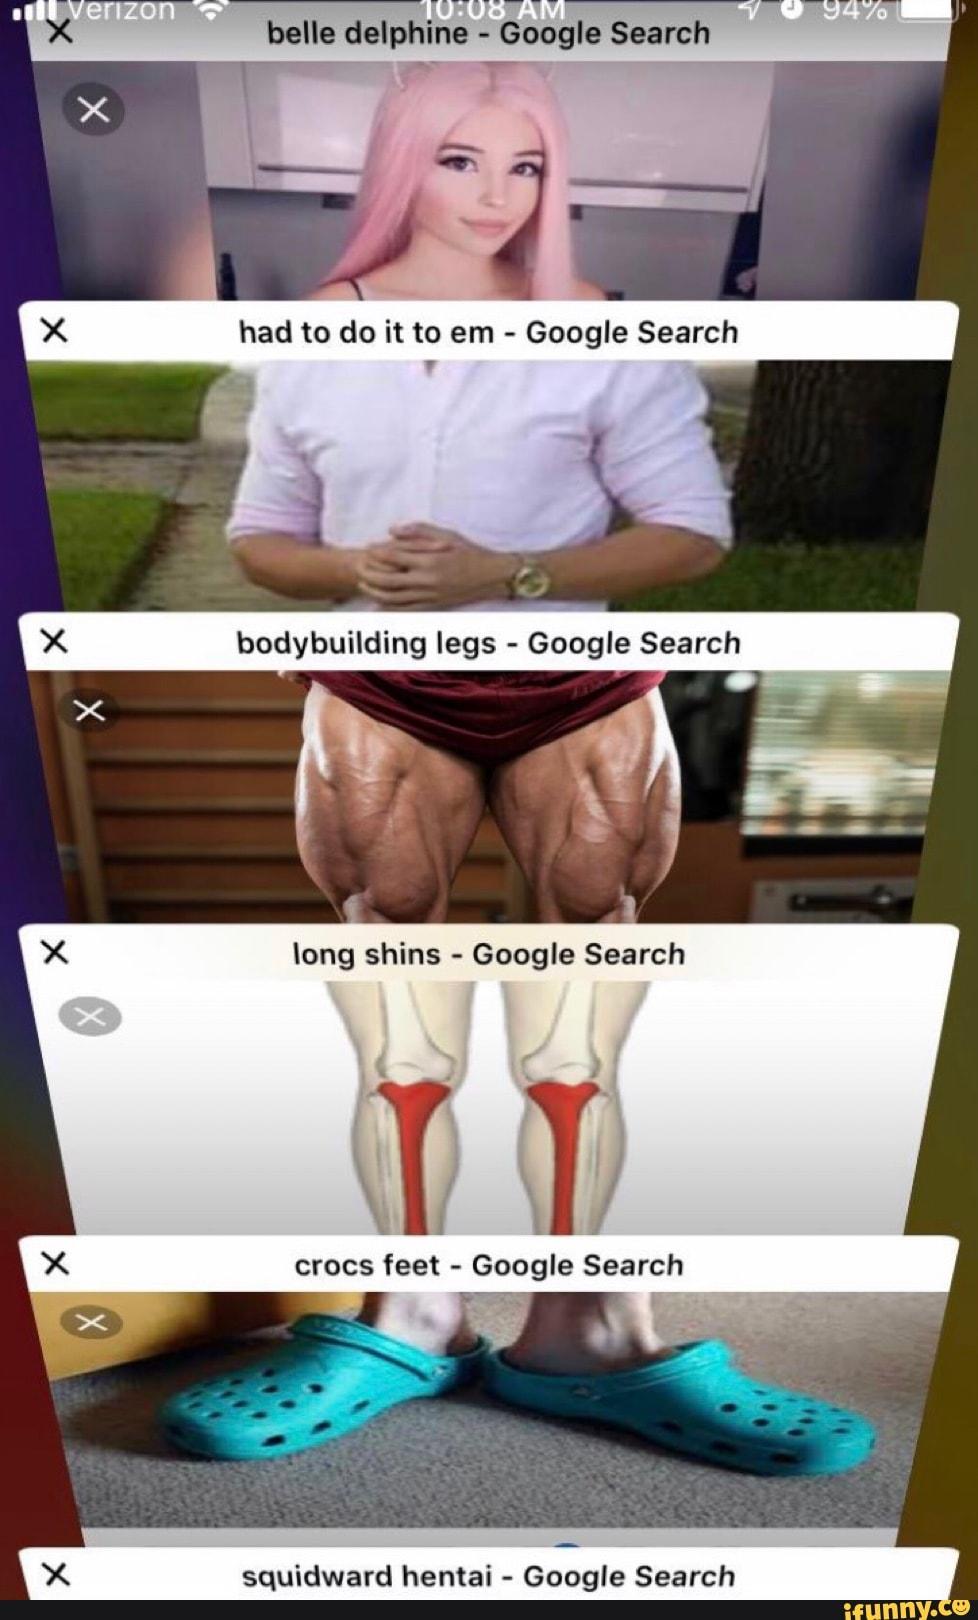 Belle Delphine Google Search Iong Shins Google Search Gr Crocs Feet Google Search X Squidward Hentai Google Search Ifunny Belle delphine, xqc, logan paul, mrbeast, shroud, tana mongeau. google search gr crocs feet